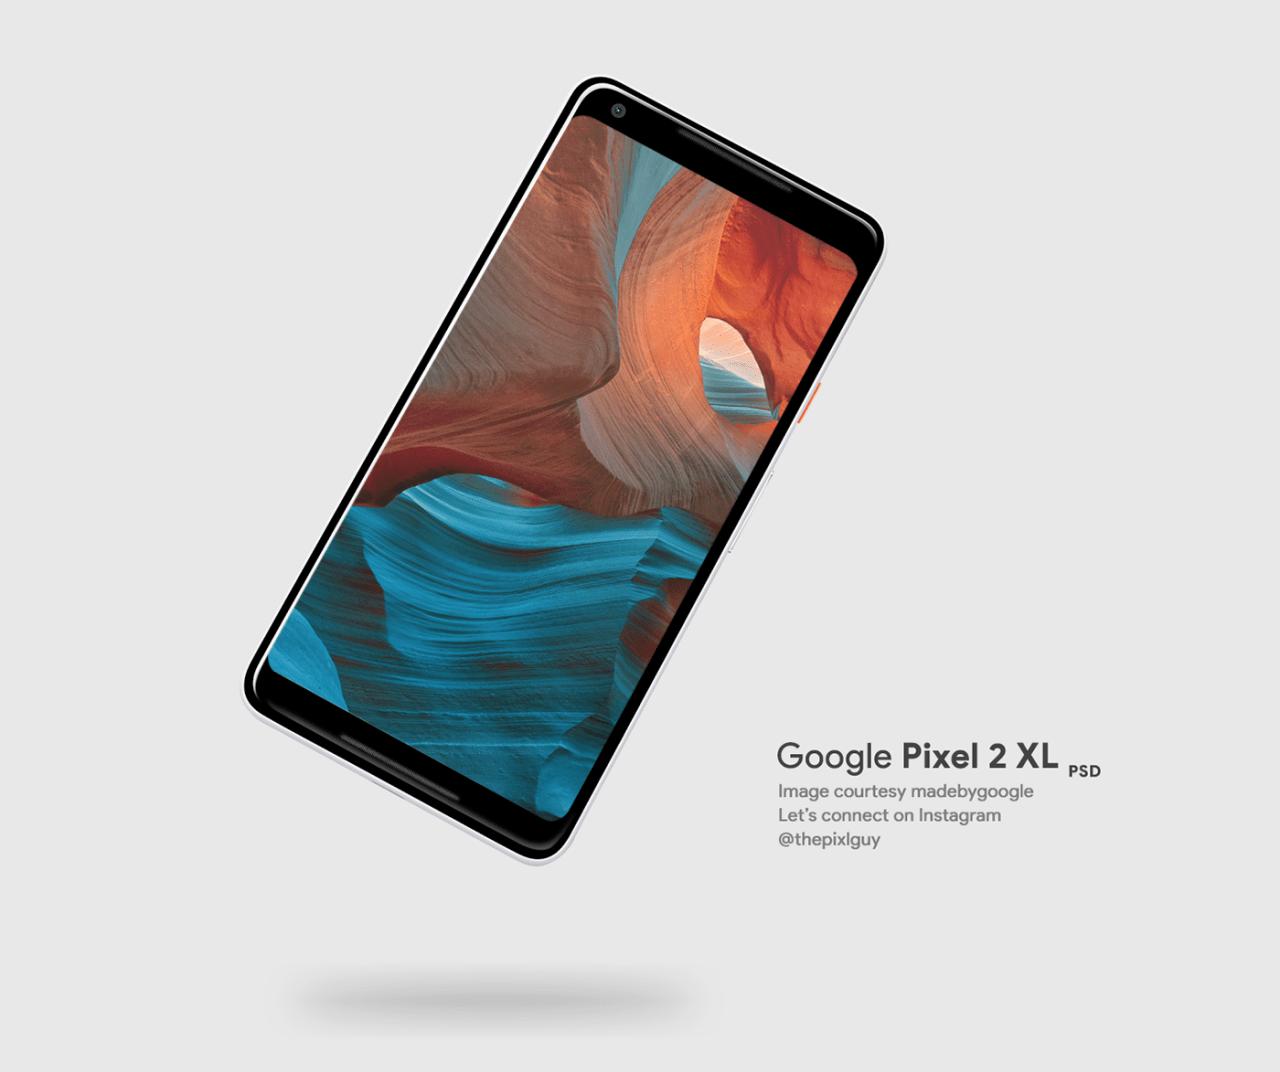 Google Pixel 2 XL PSD Mockup